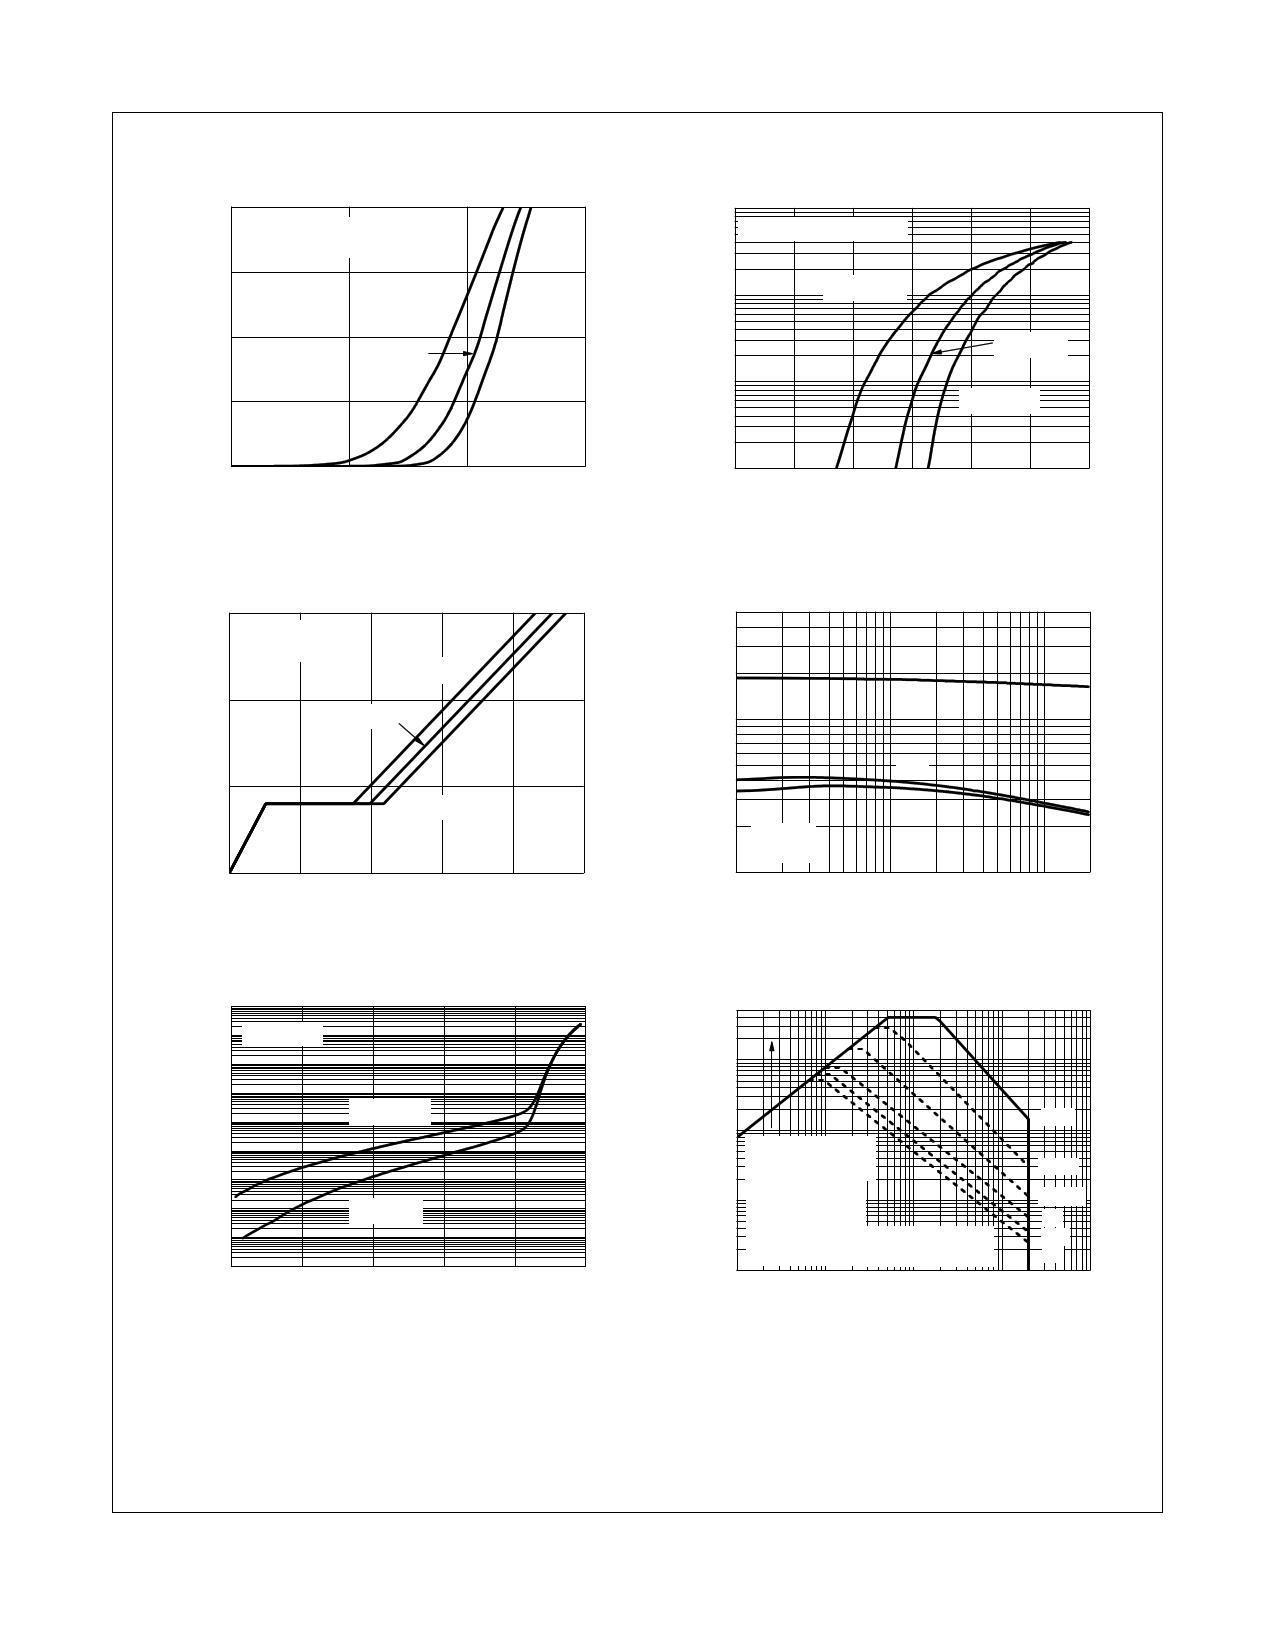 FDZ1323NZ pdf, 반도체, 판매, 대치품